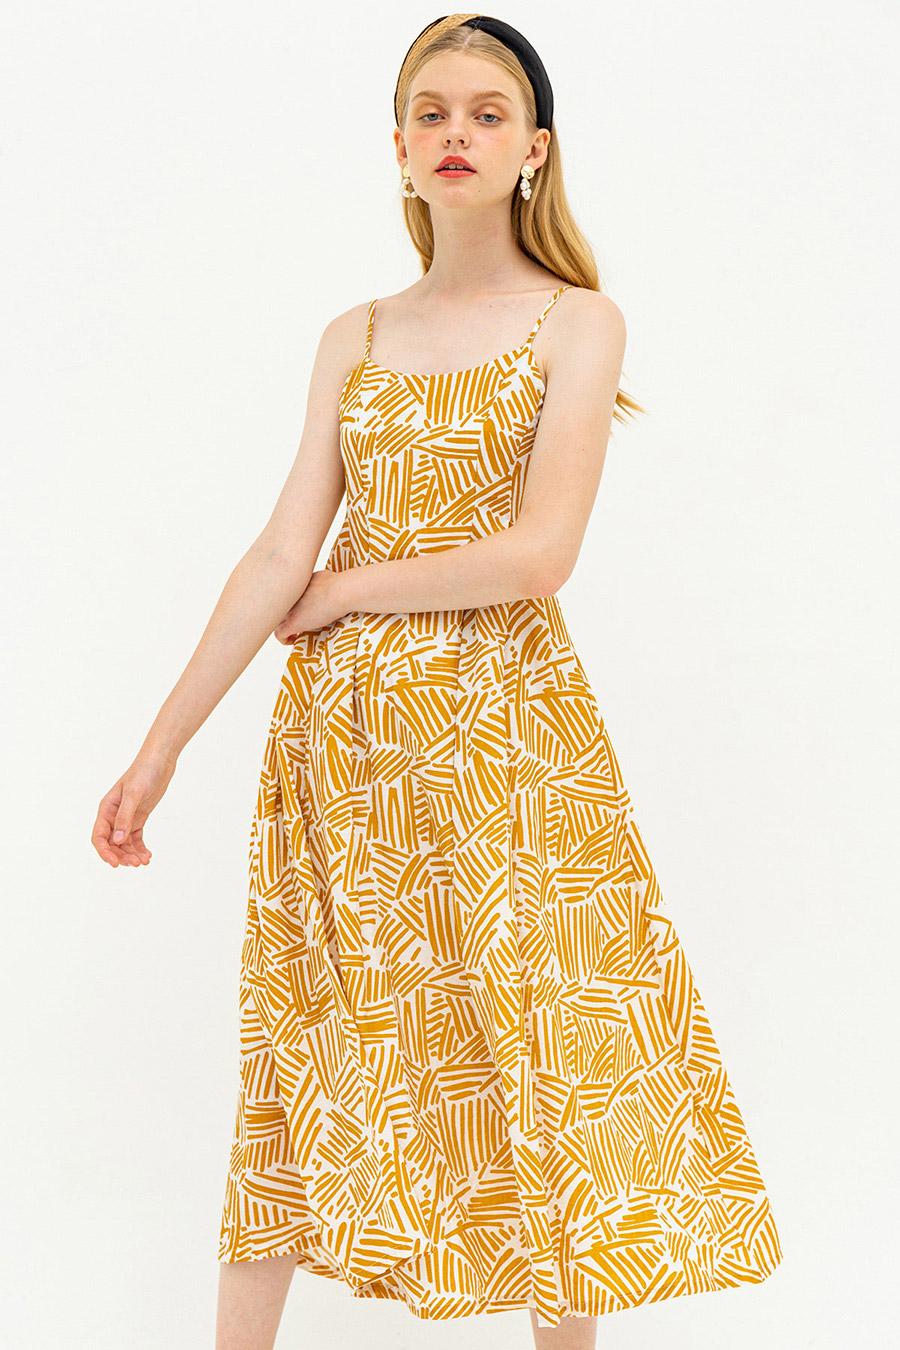 HELSINKI DRESS - BRIMSTONE  [BY MODPARADE]